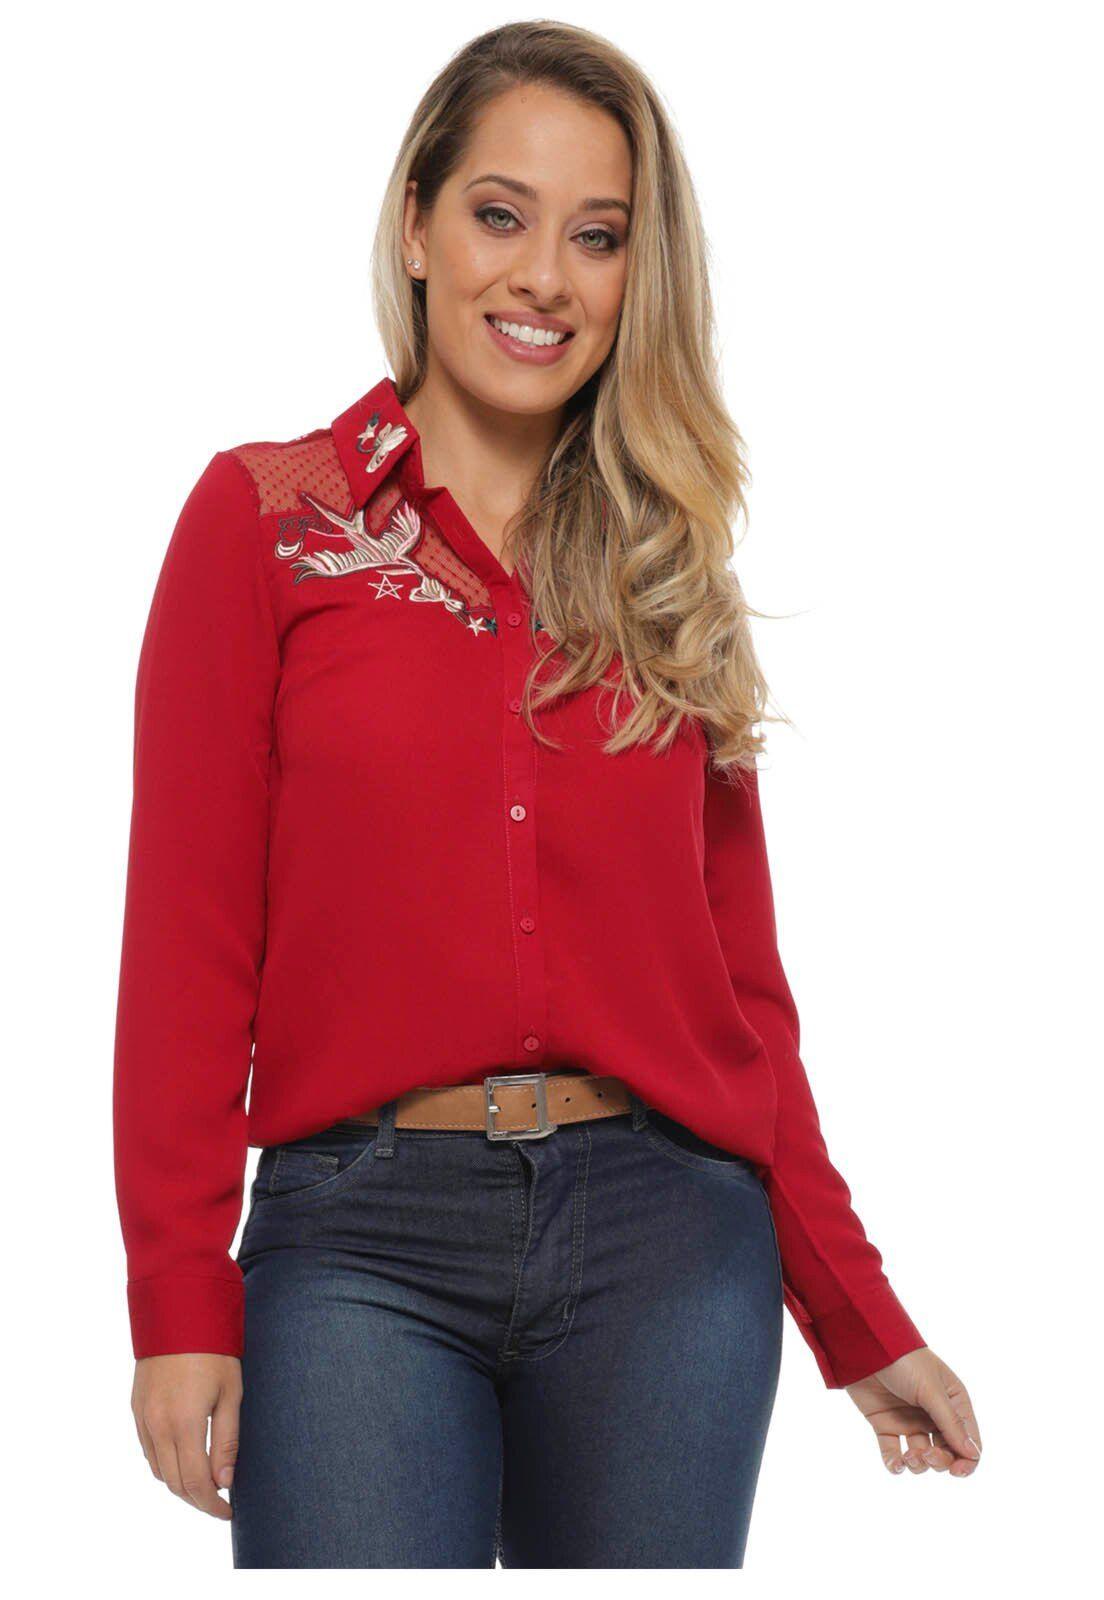 Camisa Crepe Manga Longa Vermelha | Miroa | Roupa feminina